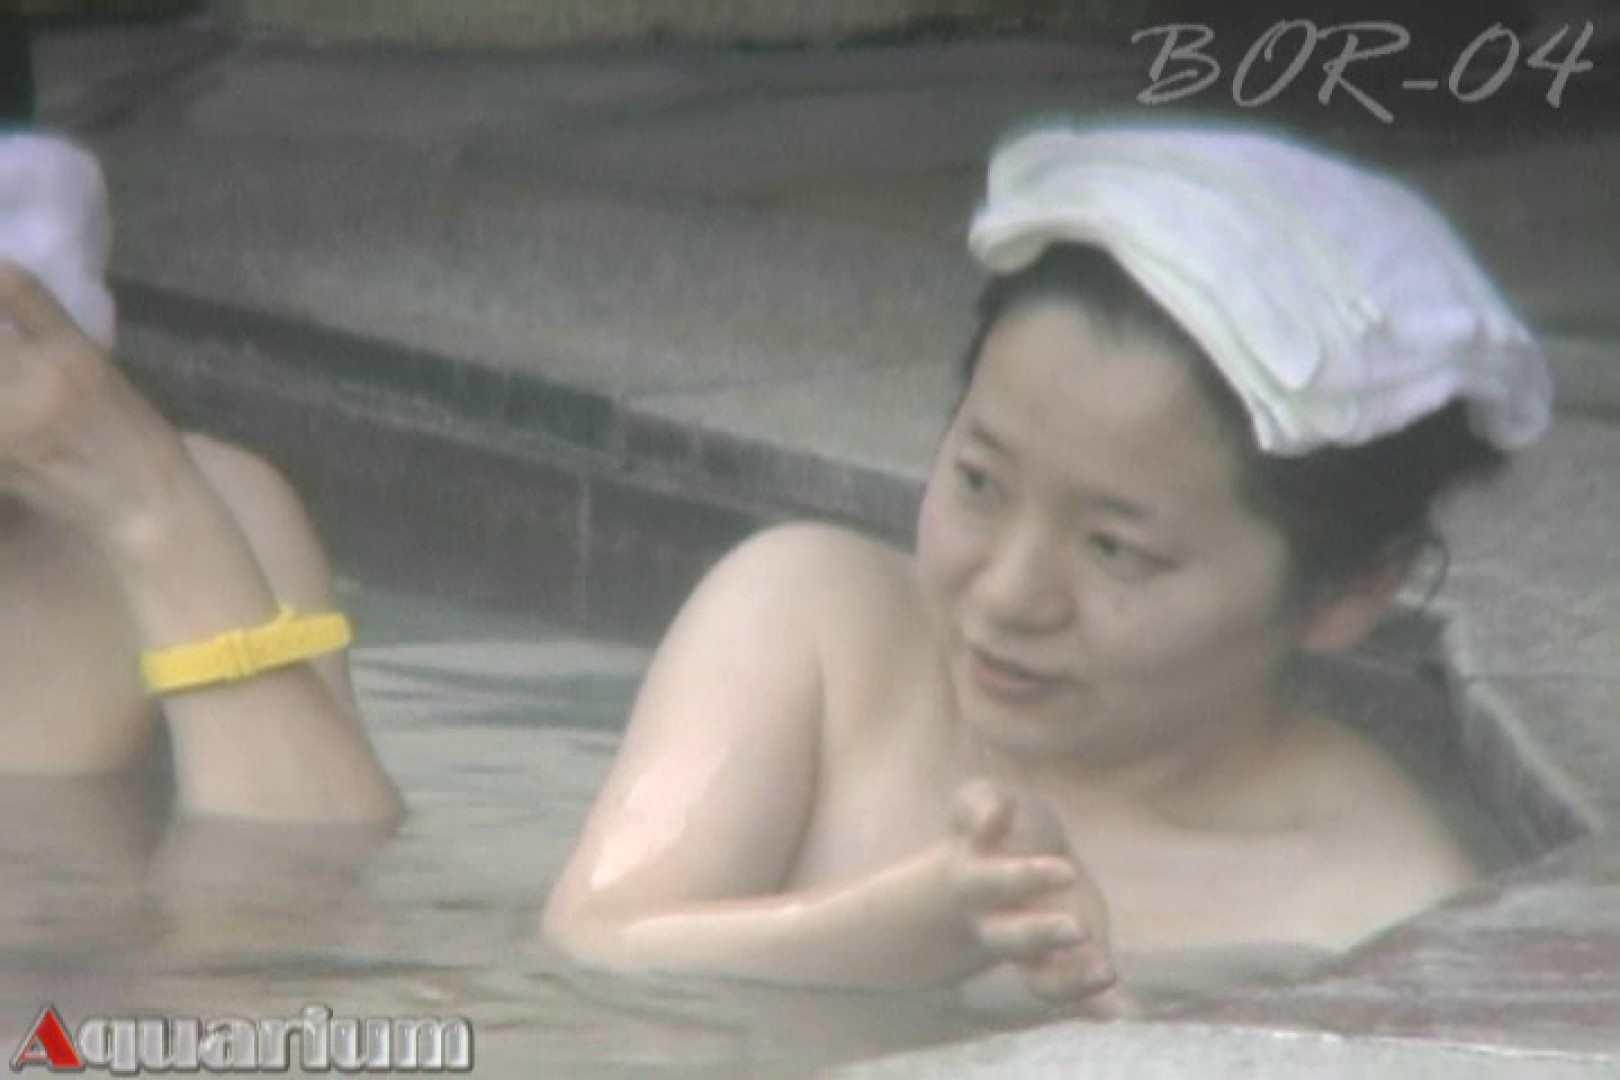 Aquaな露天風呂Vol.506 OLのエロ生活 | 露天風呂  99連発 55